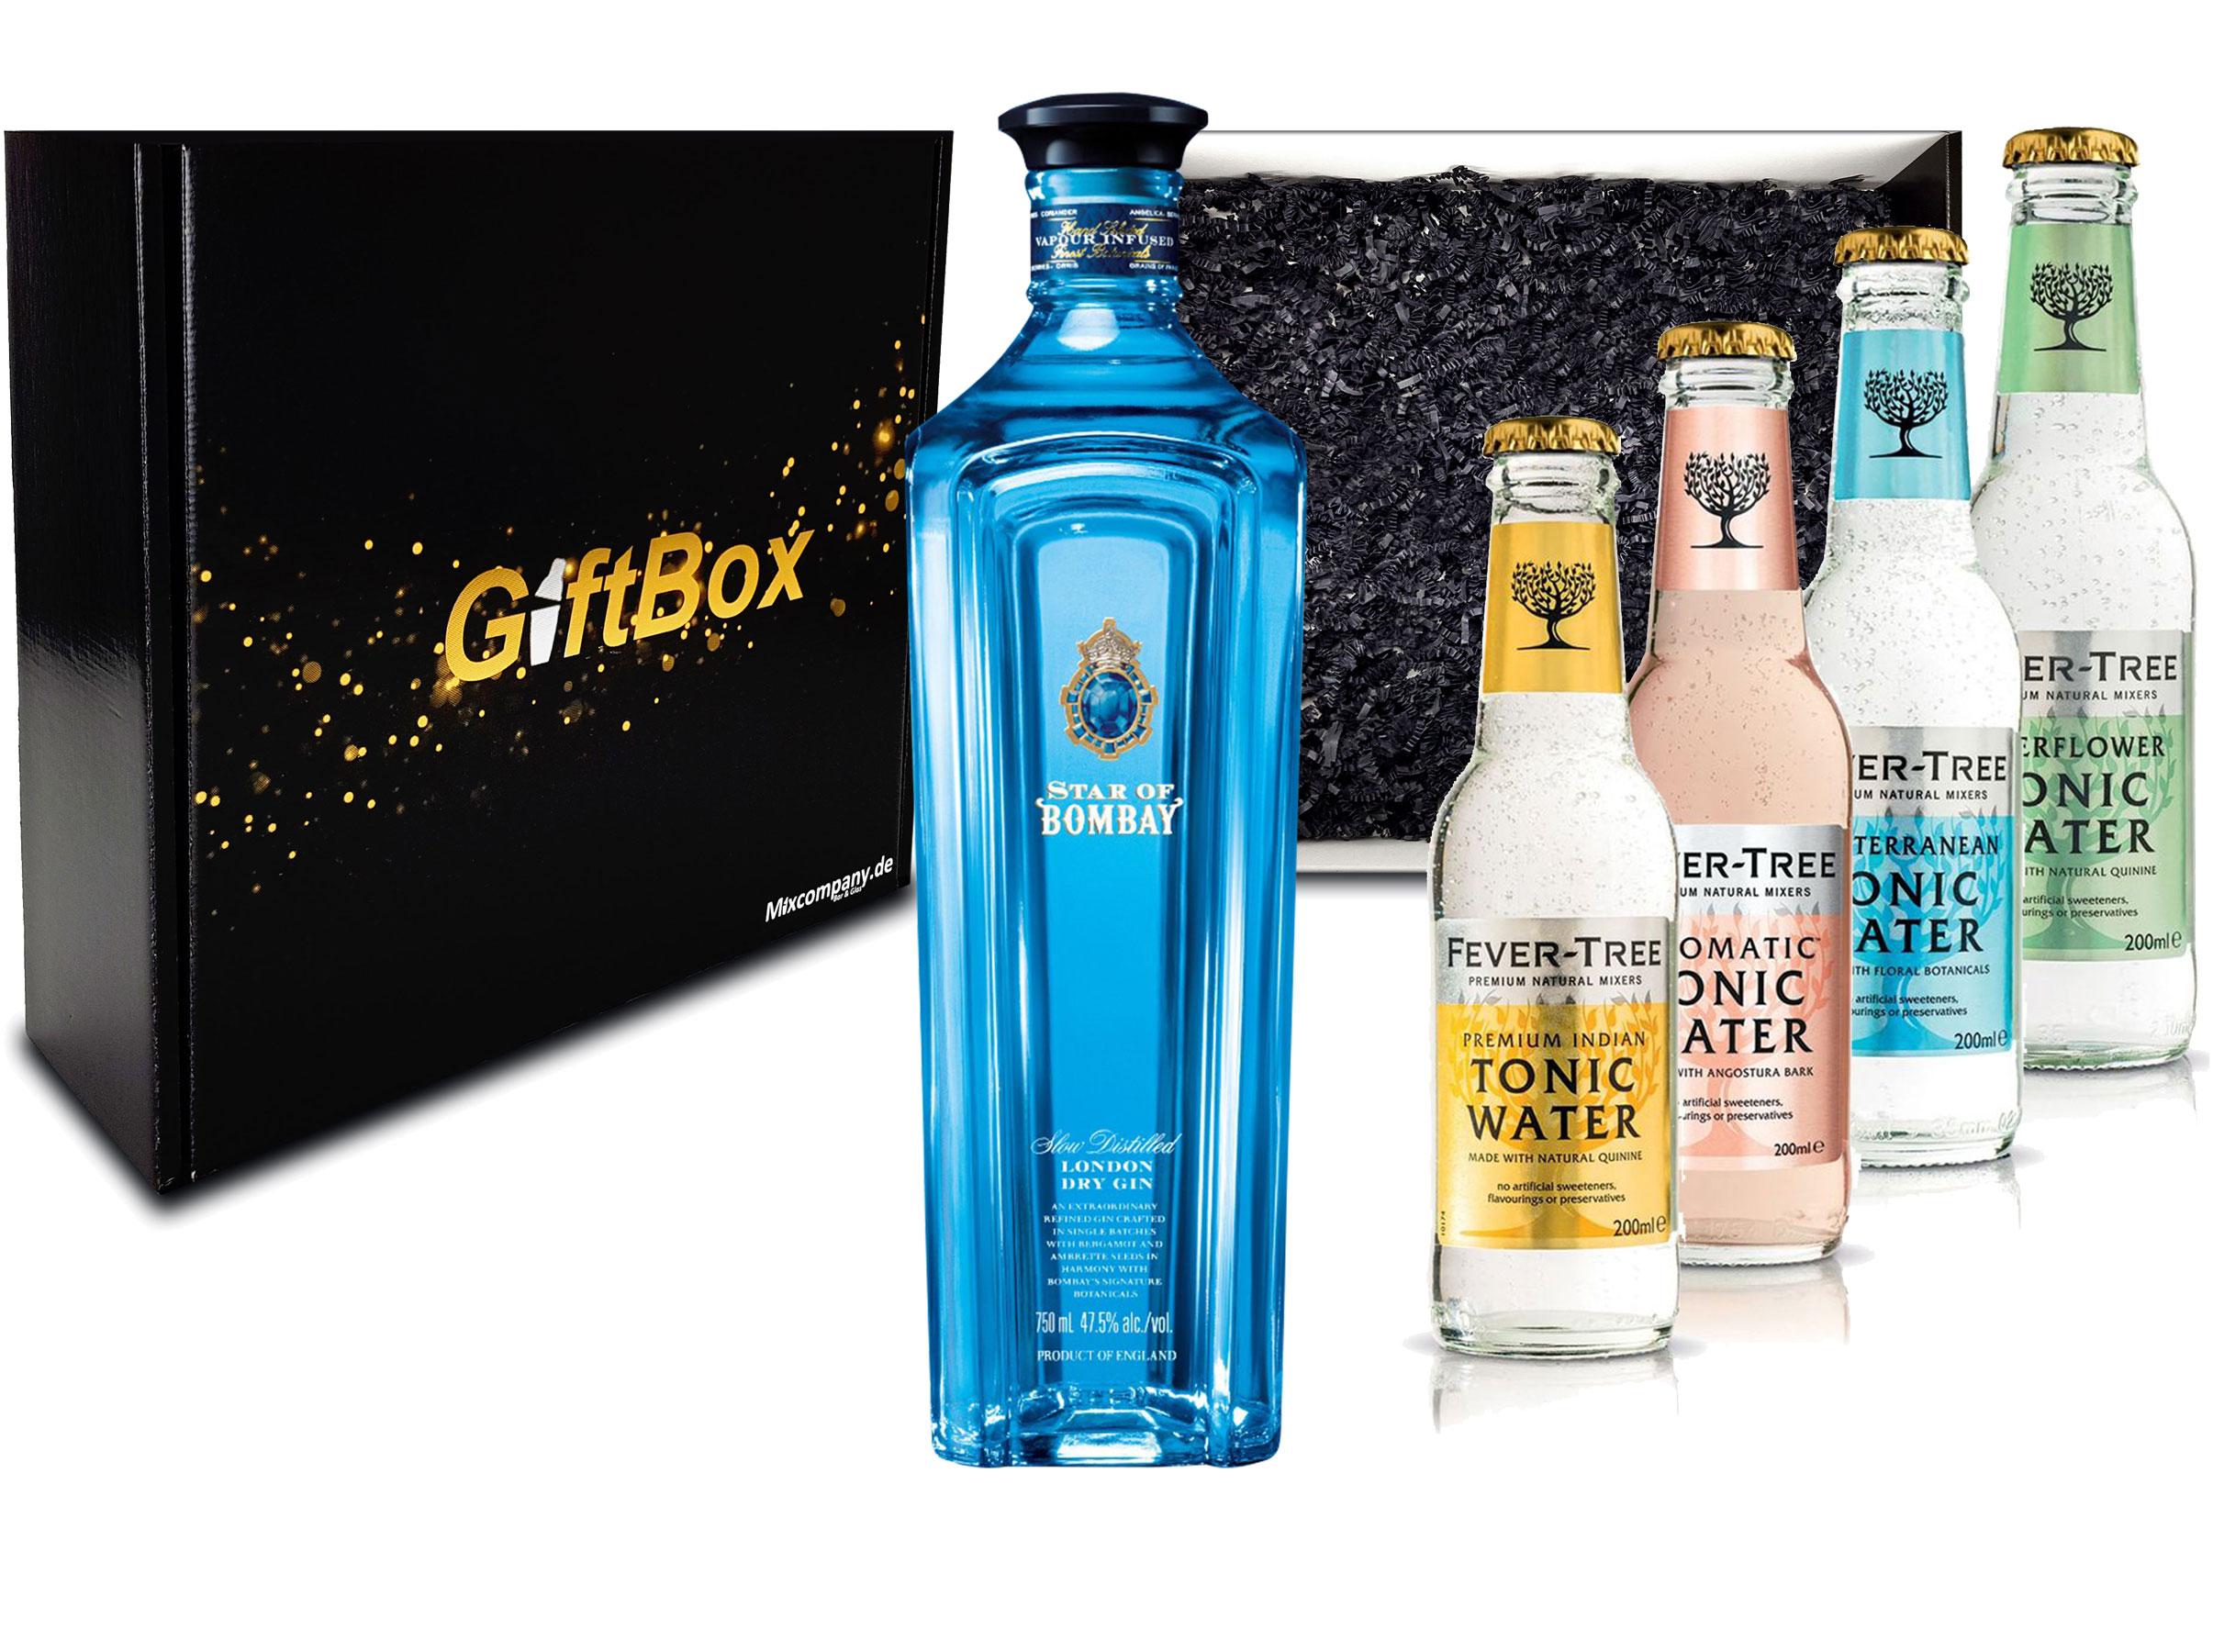 Gin Tonic Set Giftbox Geschenkset - Star of Bombay Slow Distilled London Dry Gin 0,7l (47,5% Vol) + 4x Fever Tree Tonic Water Mix je 200ml inkl. Pfand MEHRWEG -[Enthält Sulfite]